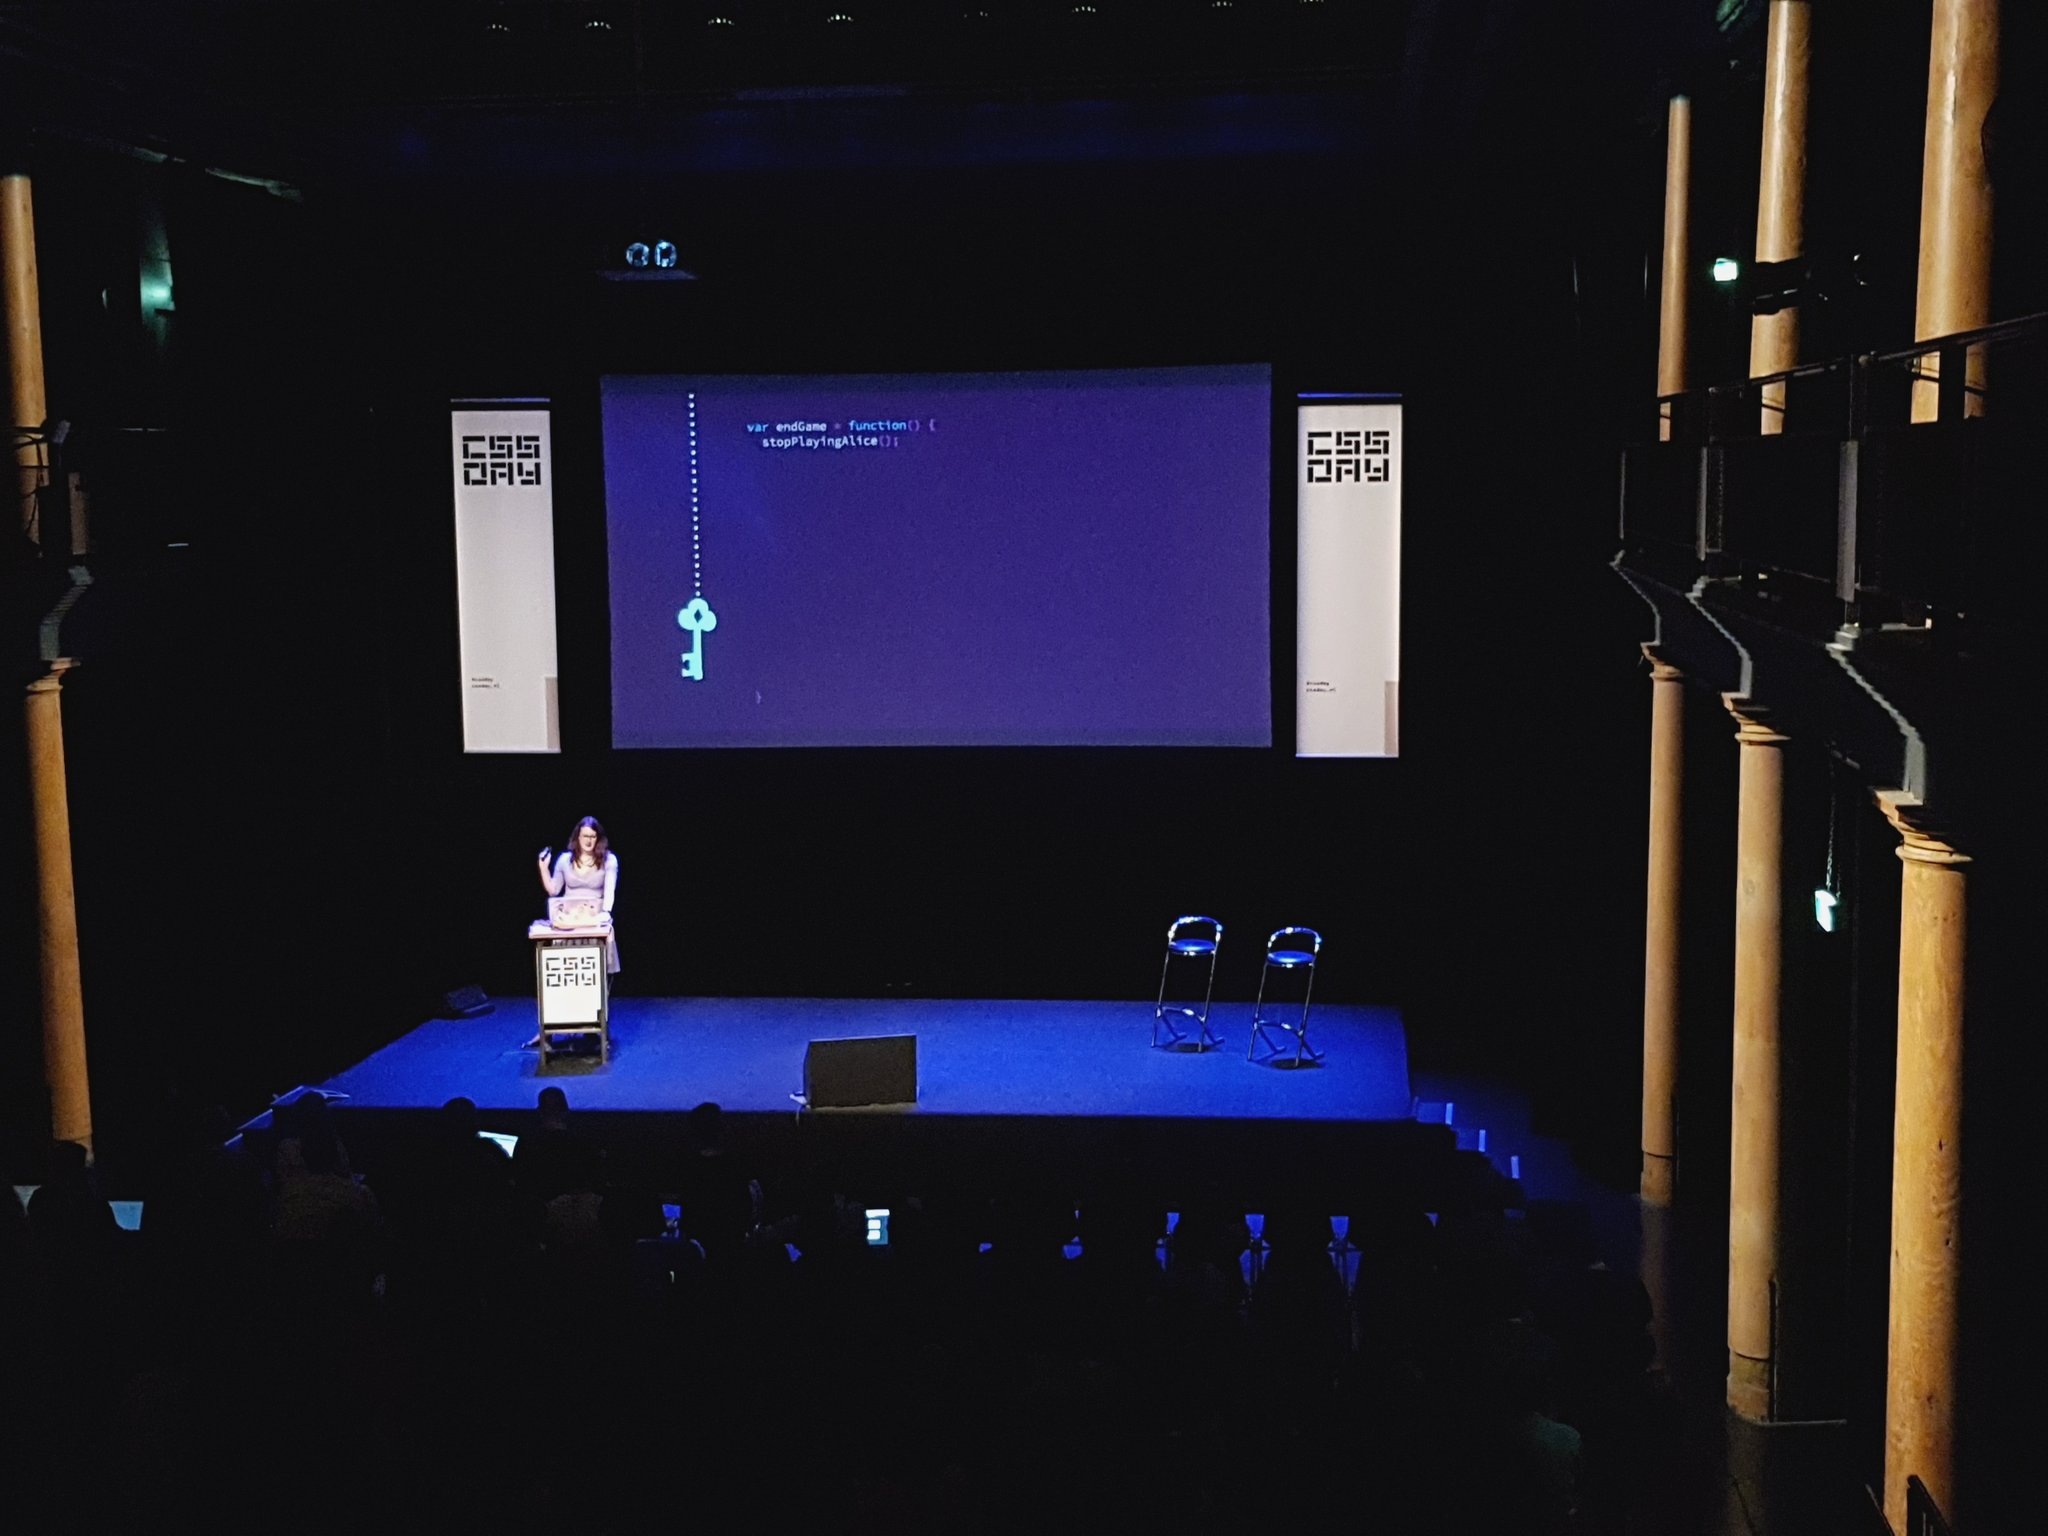 .@rachelnabors taking us down the rabbit hole of the Web Animations API. Very interesting! https://t.co/OhXUARlKyK